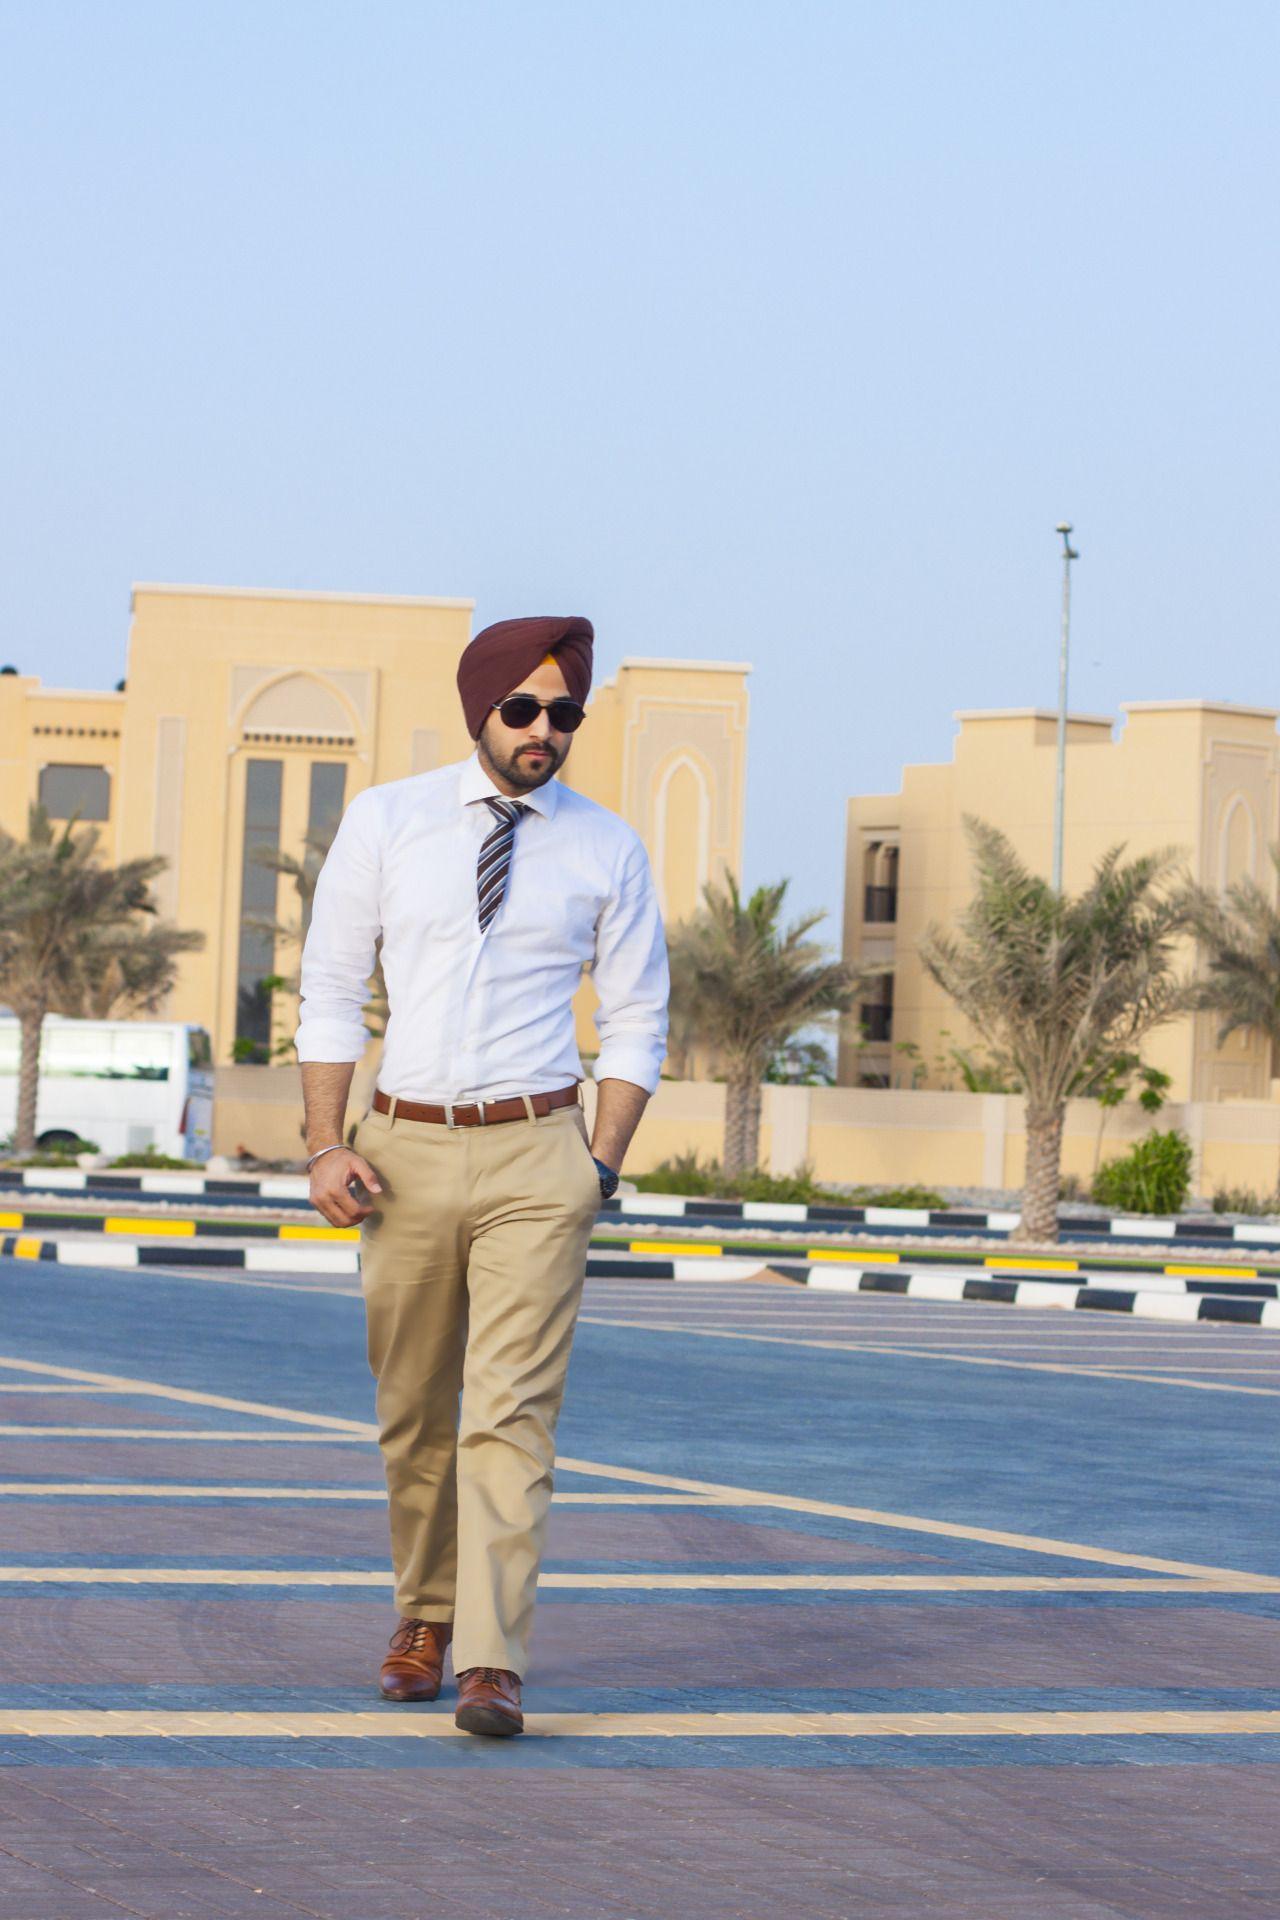 Sikh Model Sikh Men Fashion Style Surjit Singh Simple Formal Look